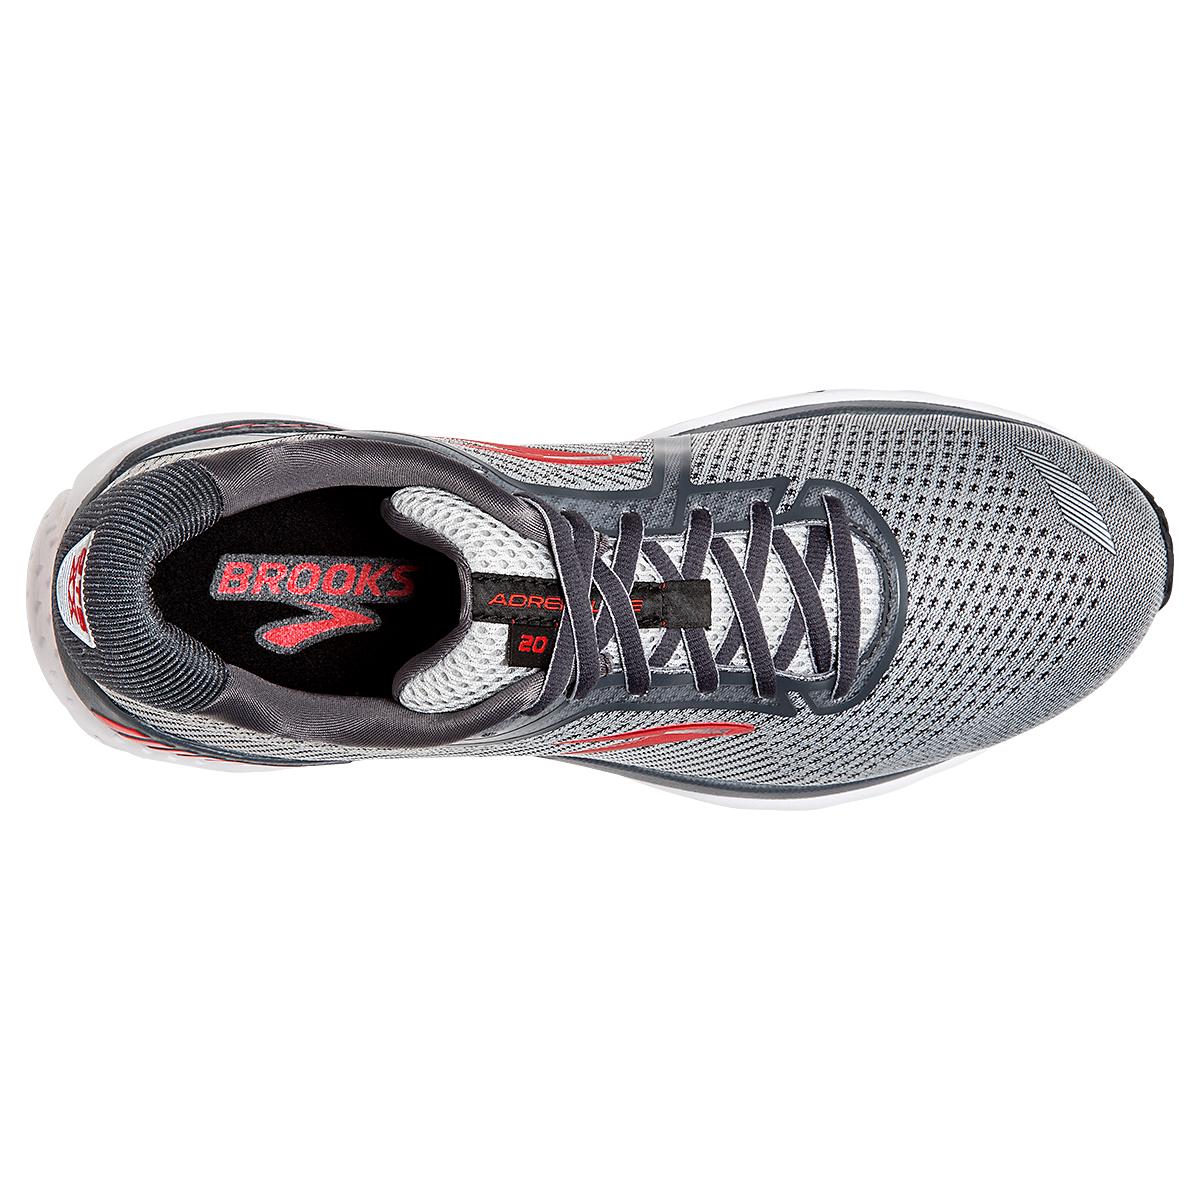 Men's Brooks Adrenaline GTS 20 Running Shoe - Color: Grey/Ebony/Red - Size: 7 - Width: Regular, Grey/Ebony/Red, large, image 2